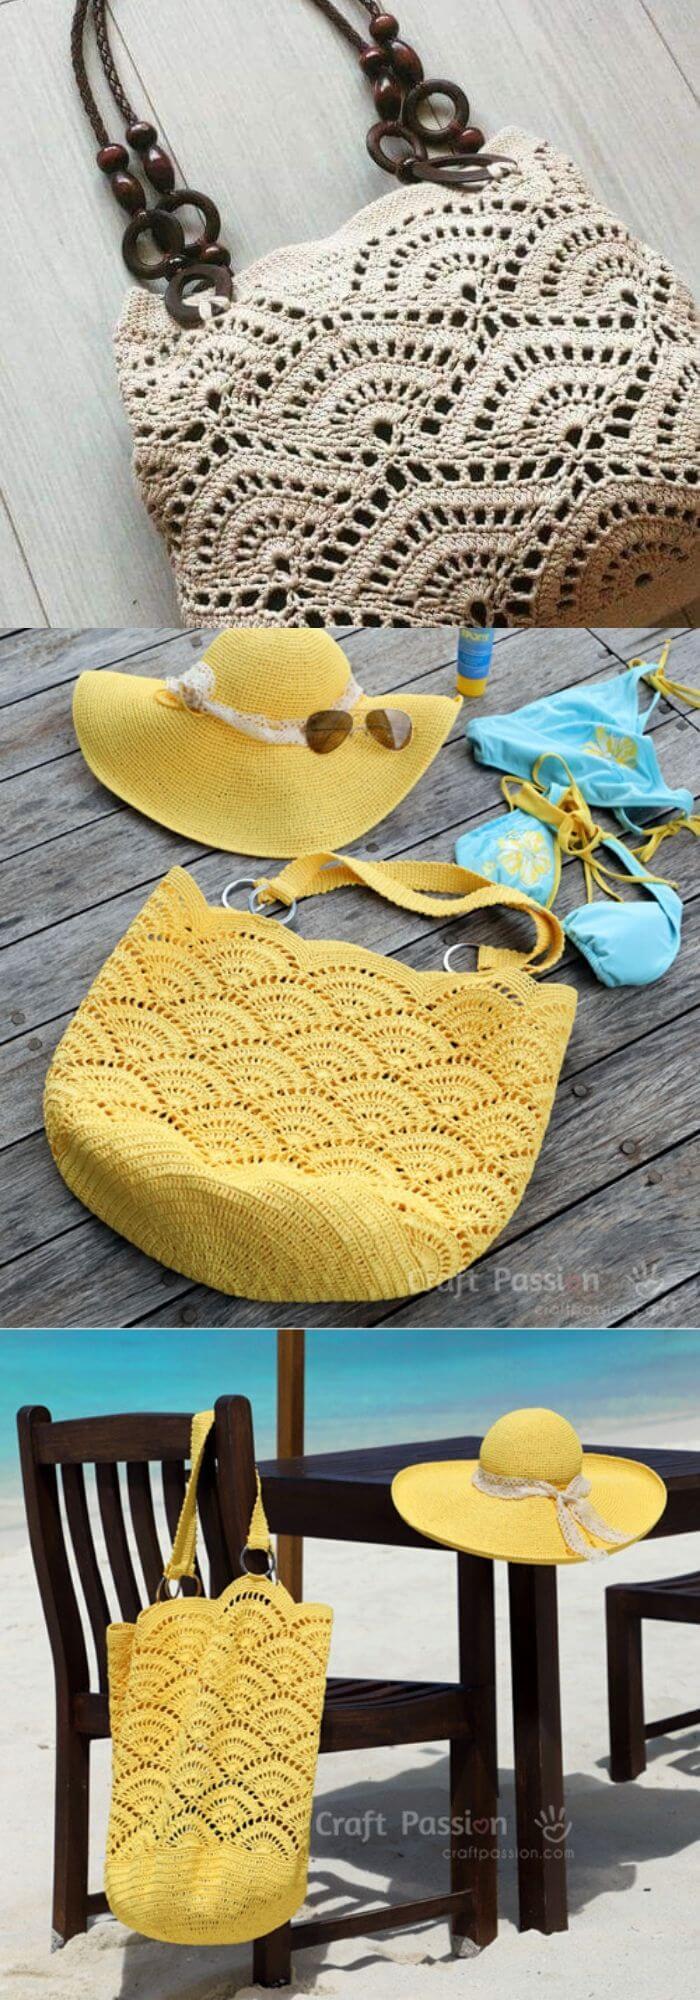 The beach bag pattern